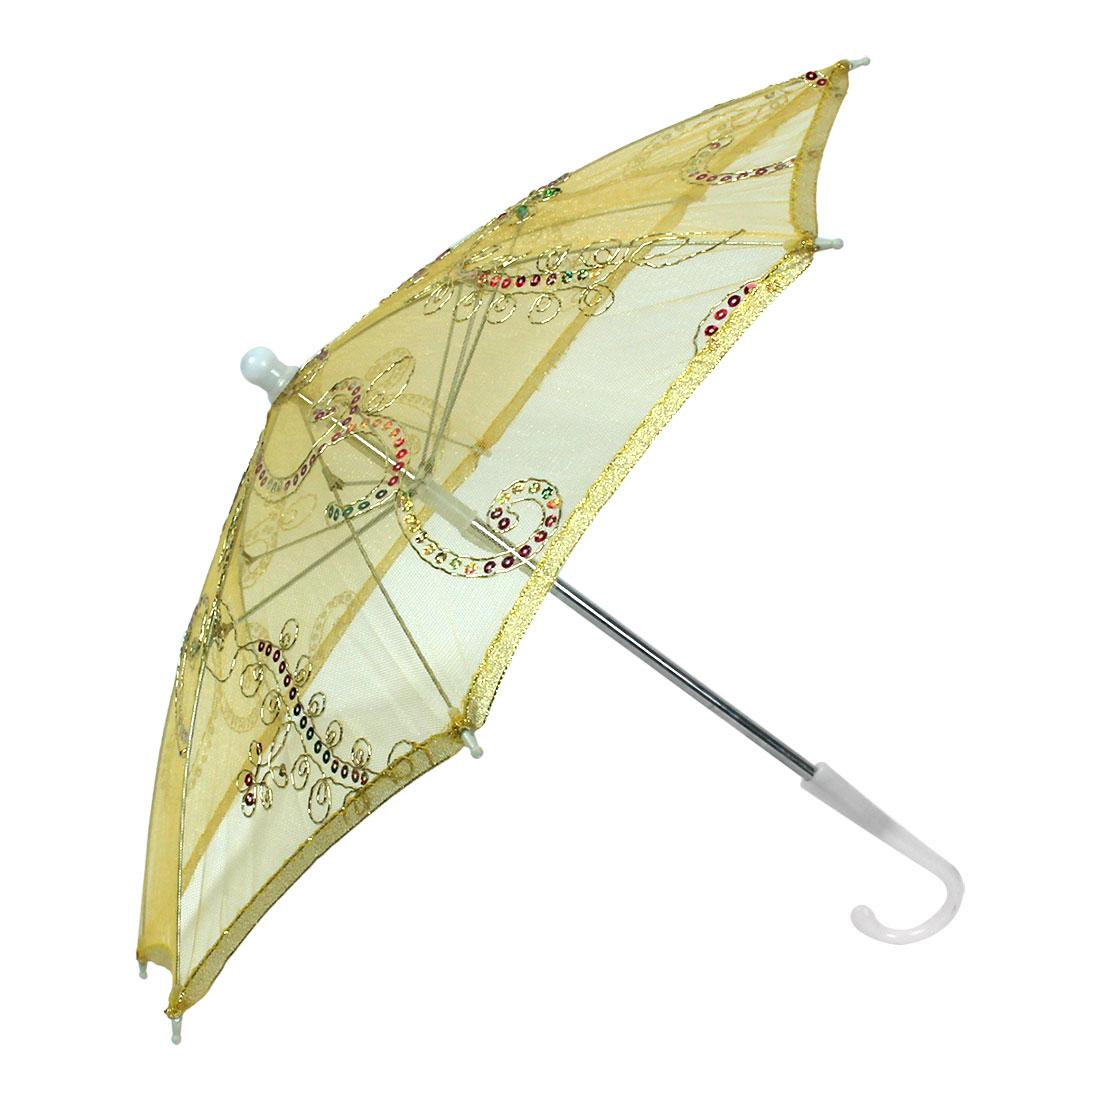 Sequin Decor Gold Tone Edge Flower Pattern Yellow Mini Lace Parasol Umbrella